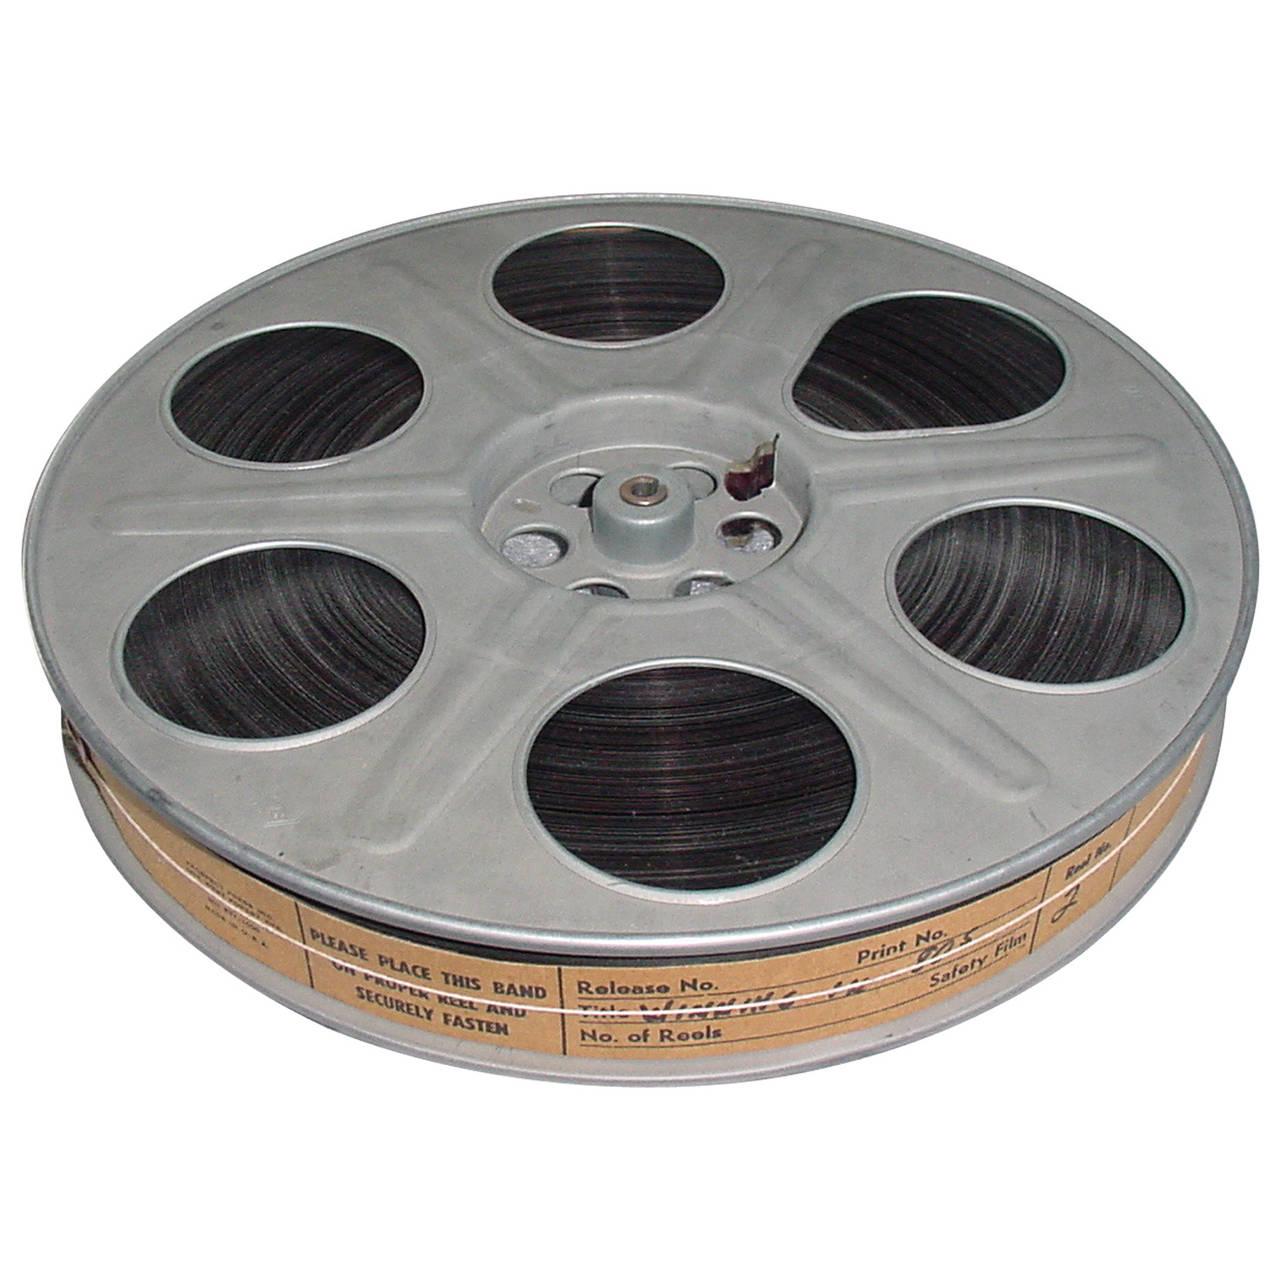 Original 8mm Film Reel of 'Poltergeist'